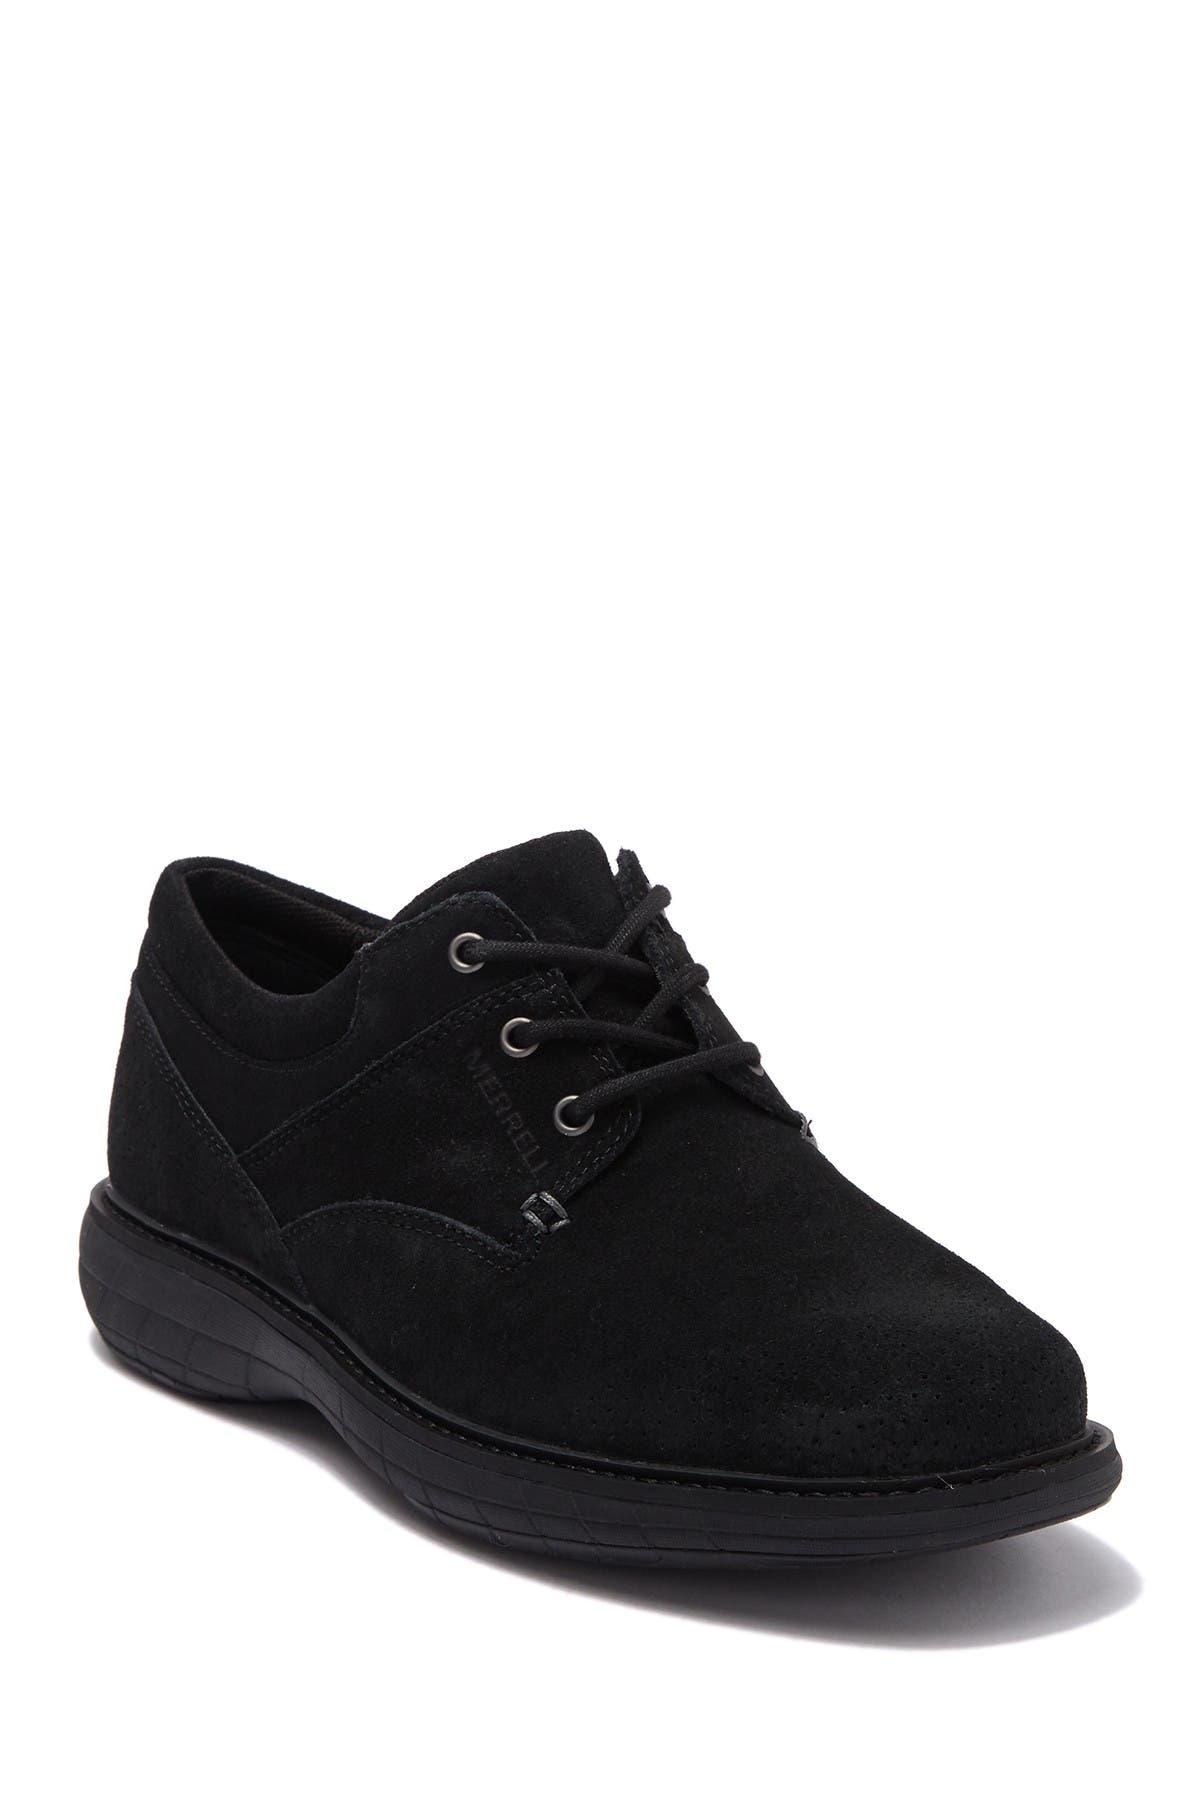 Merrell | World Vue Lace-Up Shoe